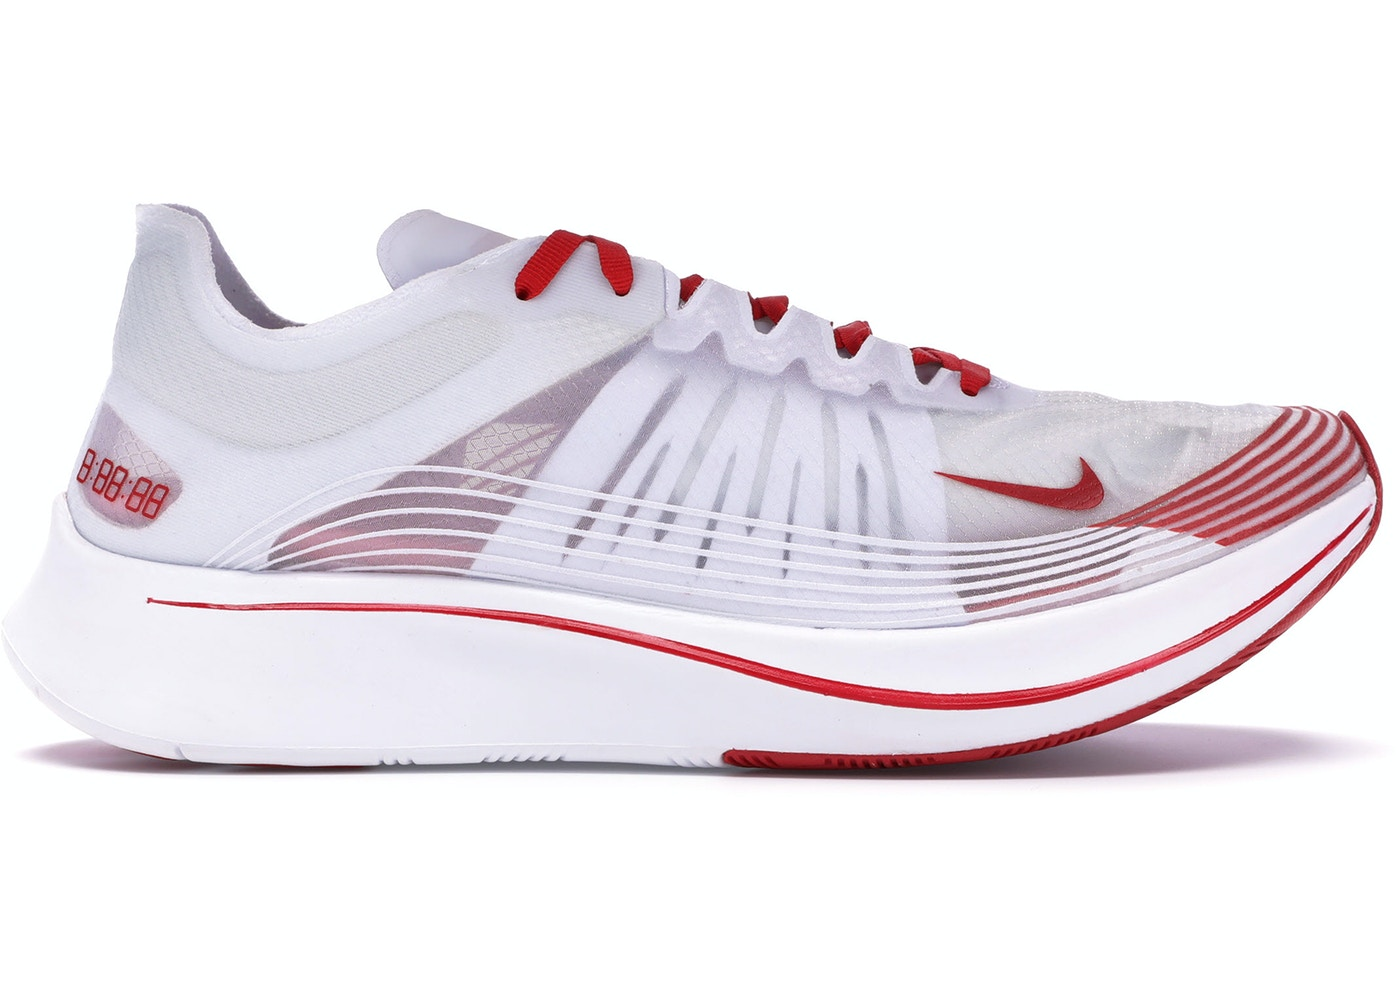 Nike Zoom Fly Tokyo - AJ9282-100 5b154f9d7